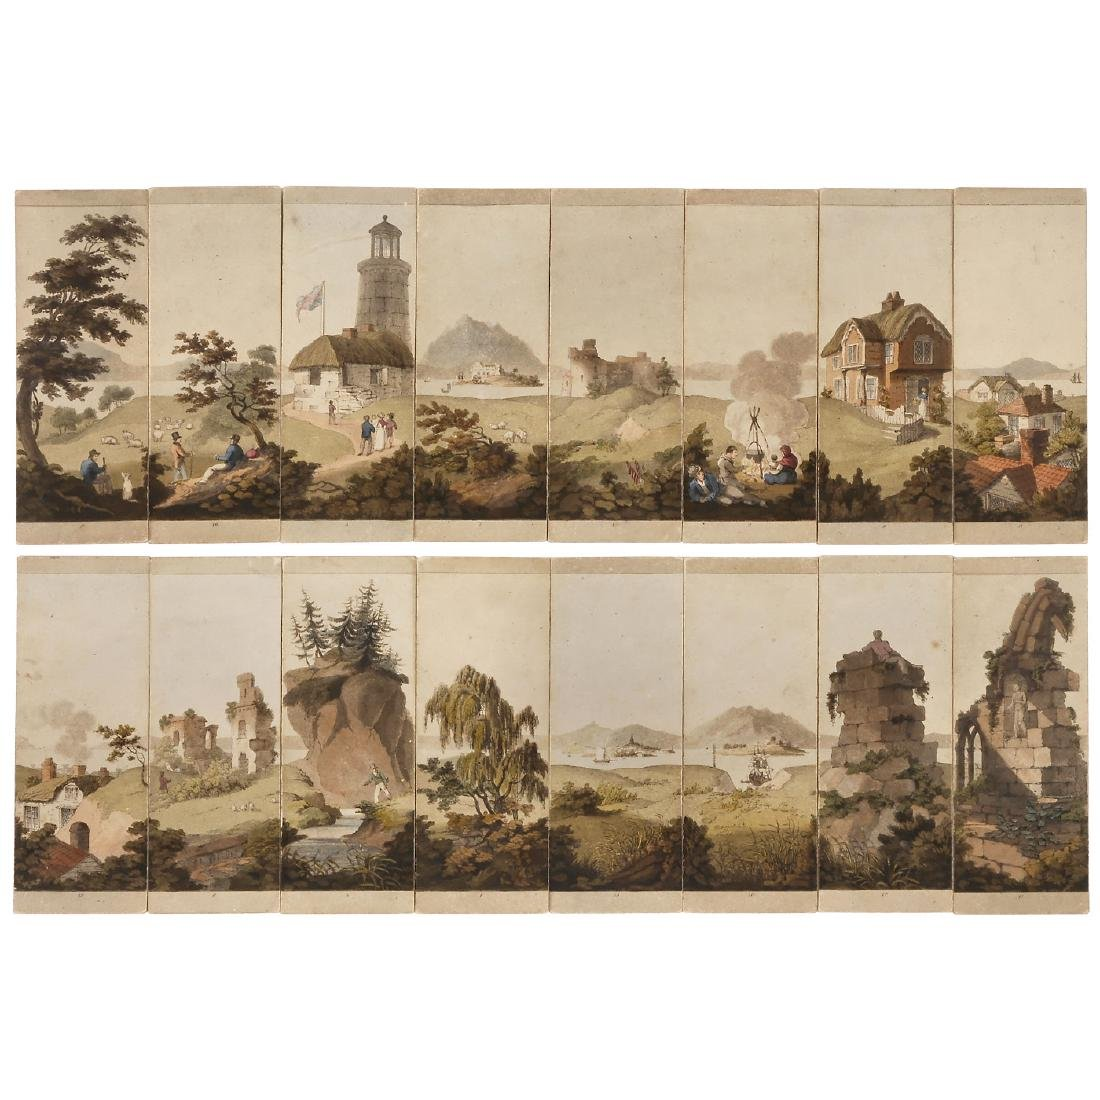 Myriorama Sectional Panorama, c. 1820